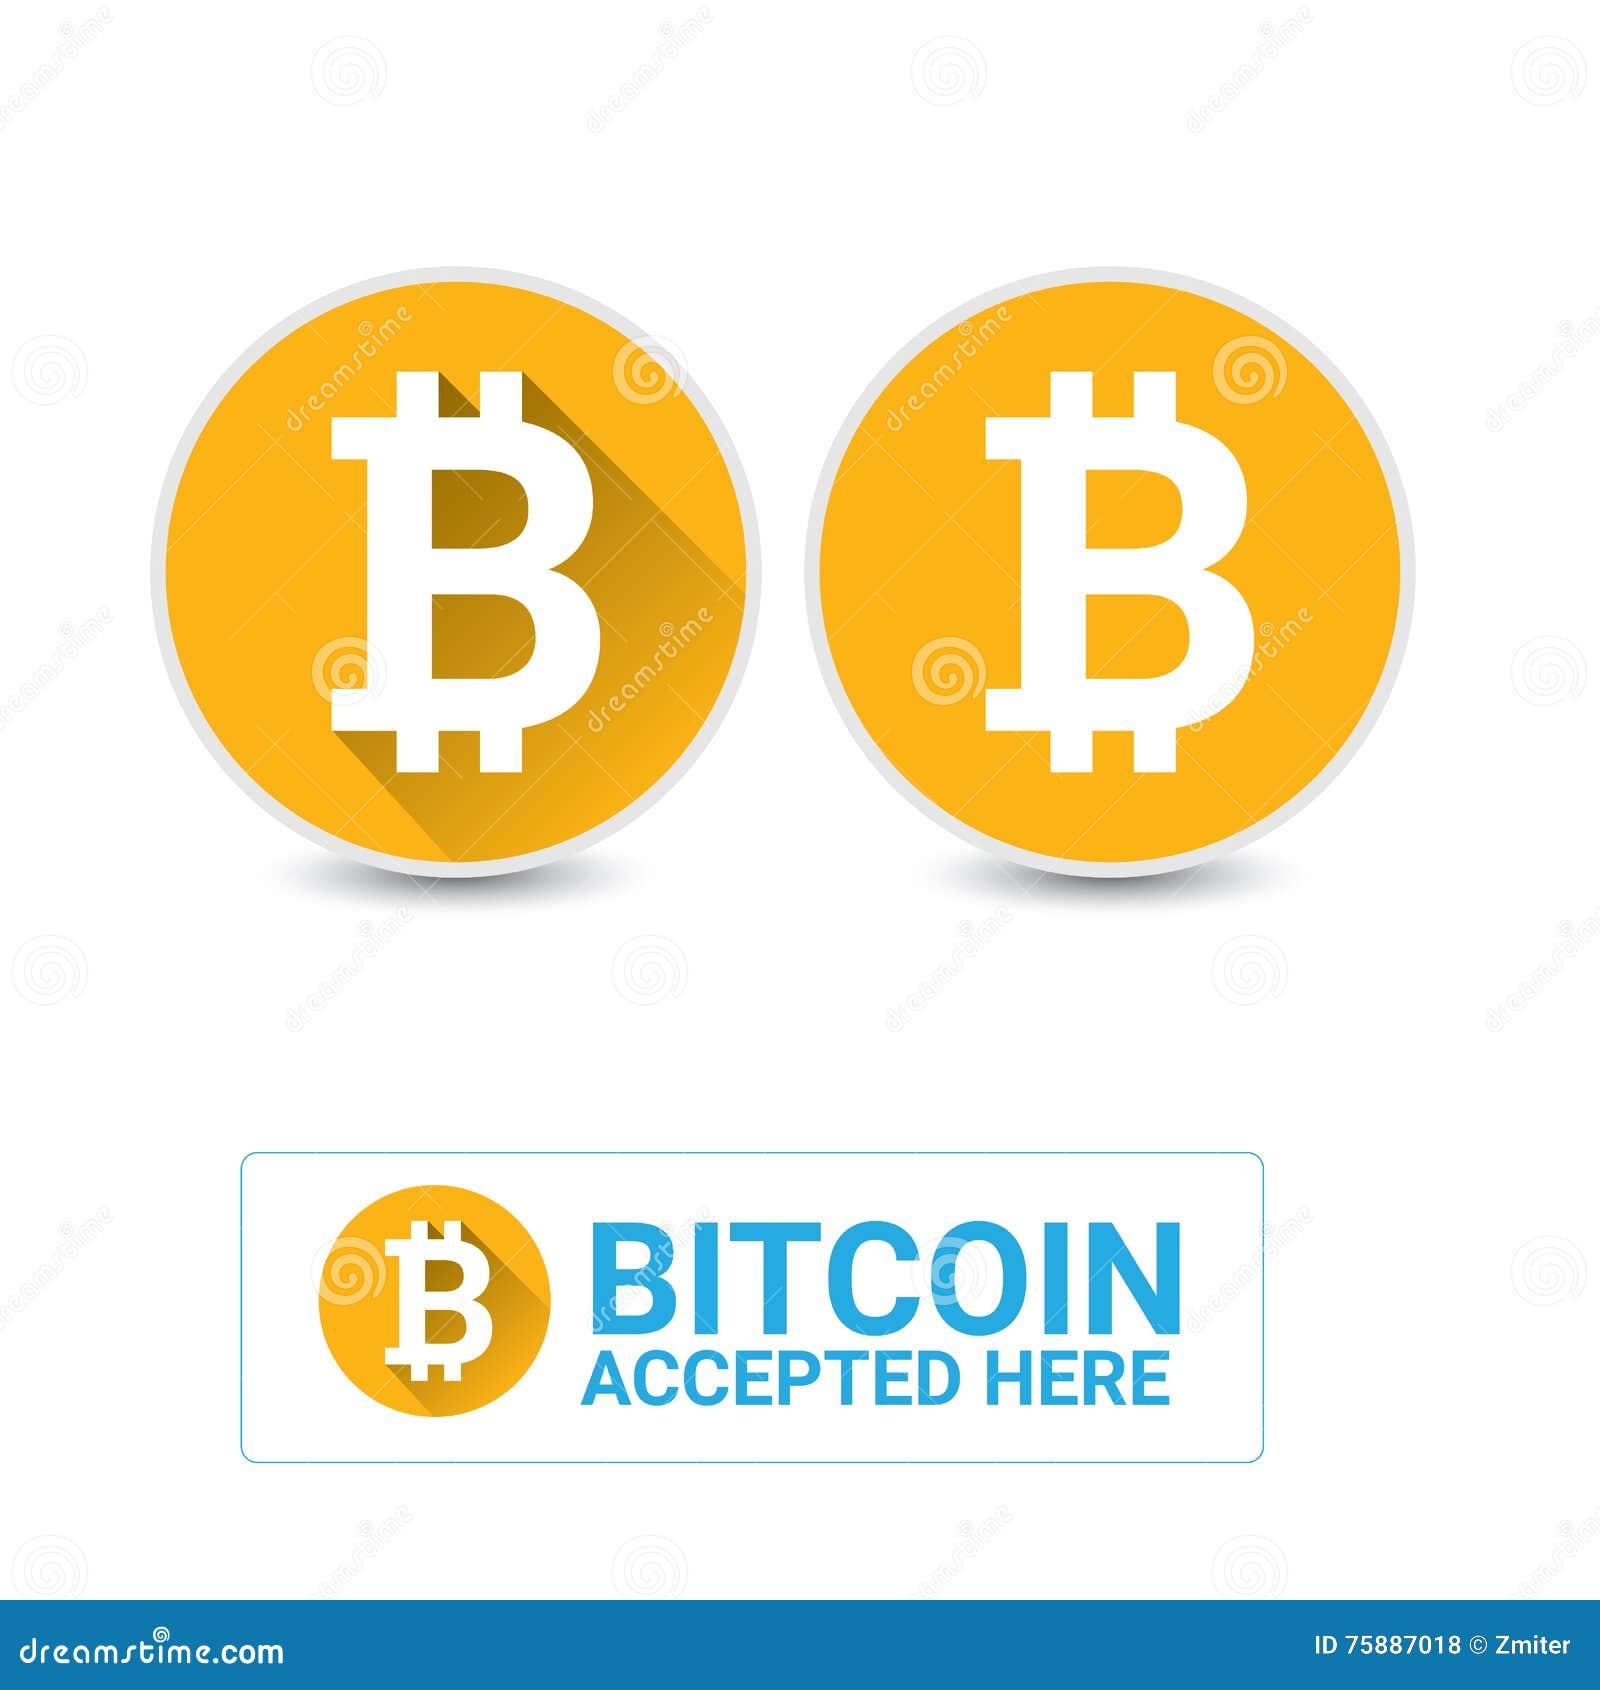 Bitcoin symbol unicode - Korean coin 100 value in india pdf